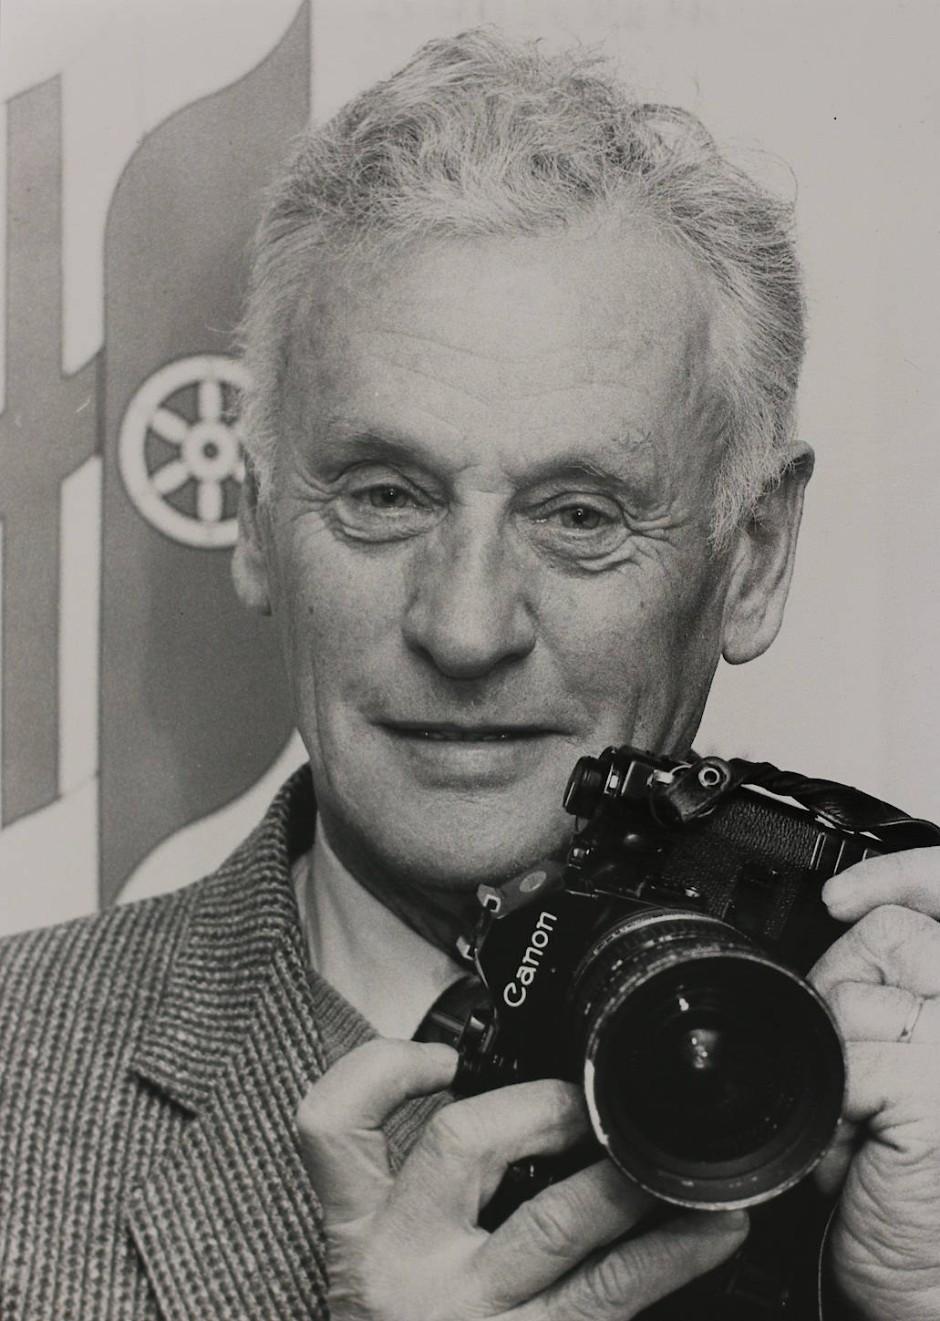 Rudi Klos (1927-1995)